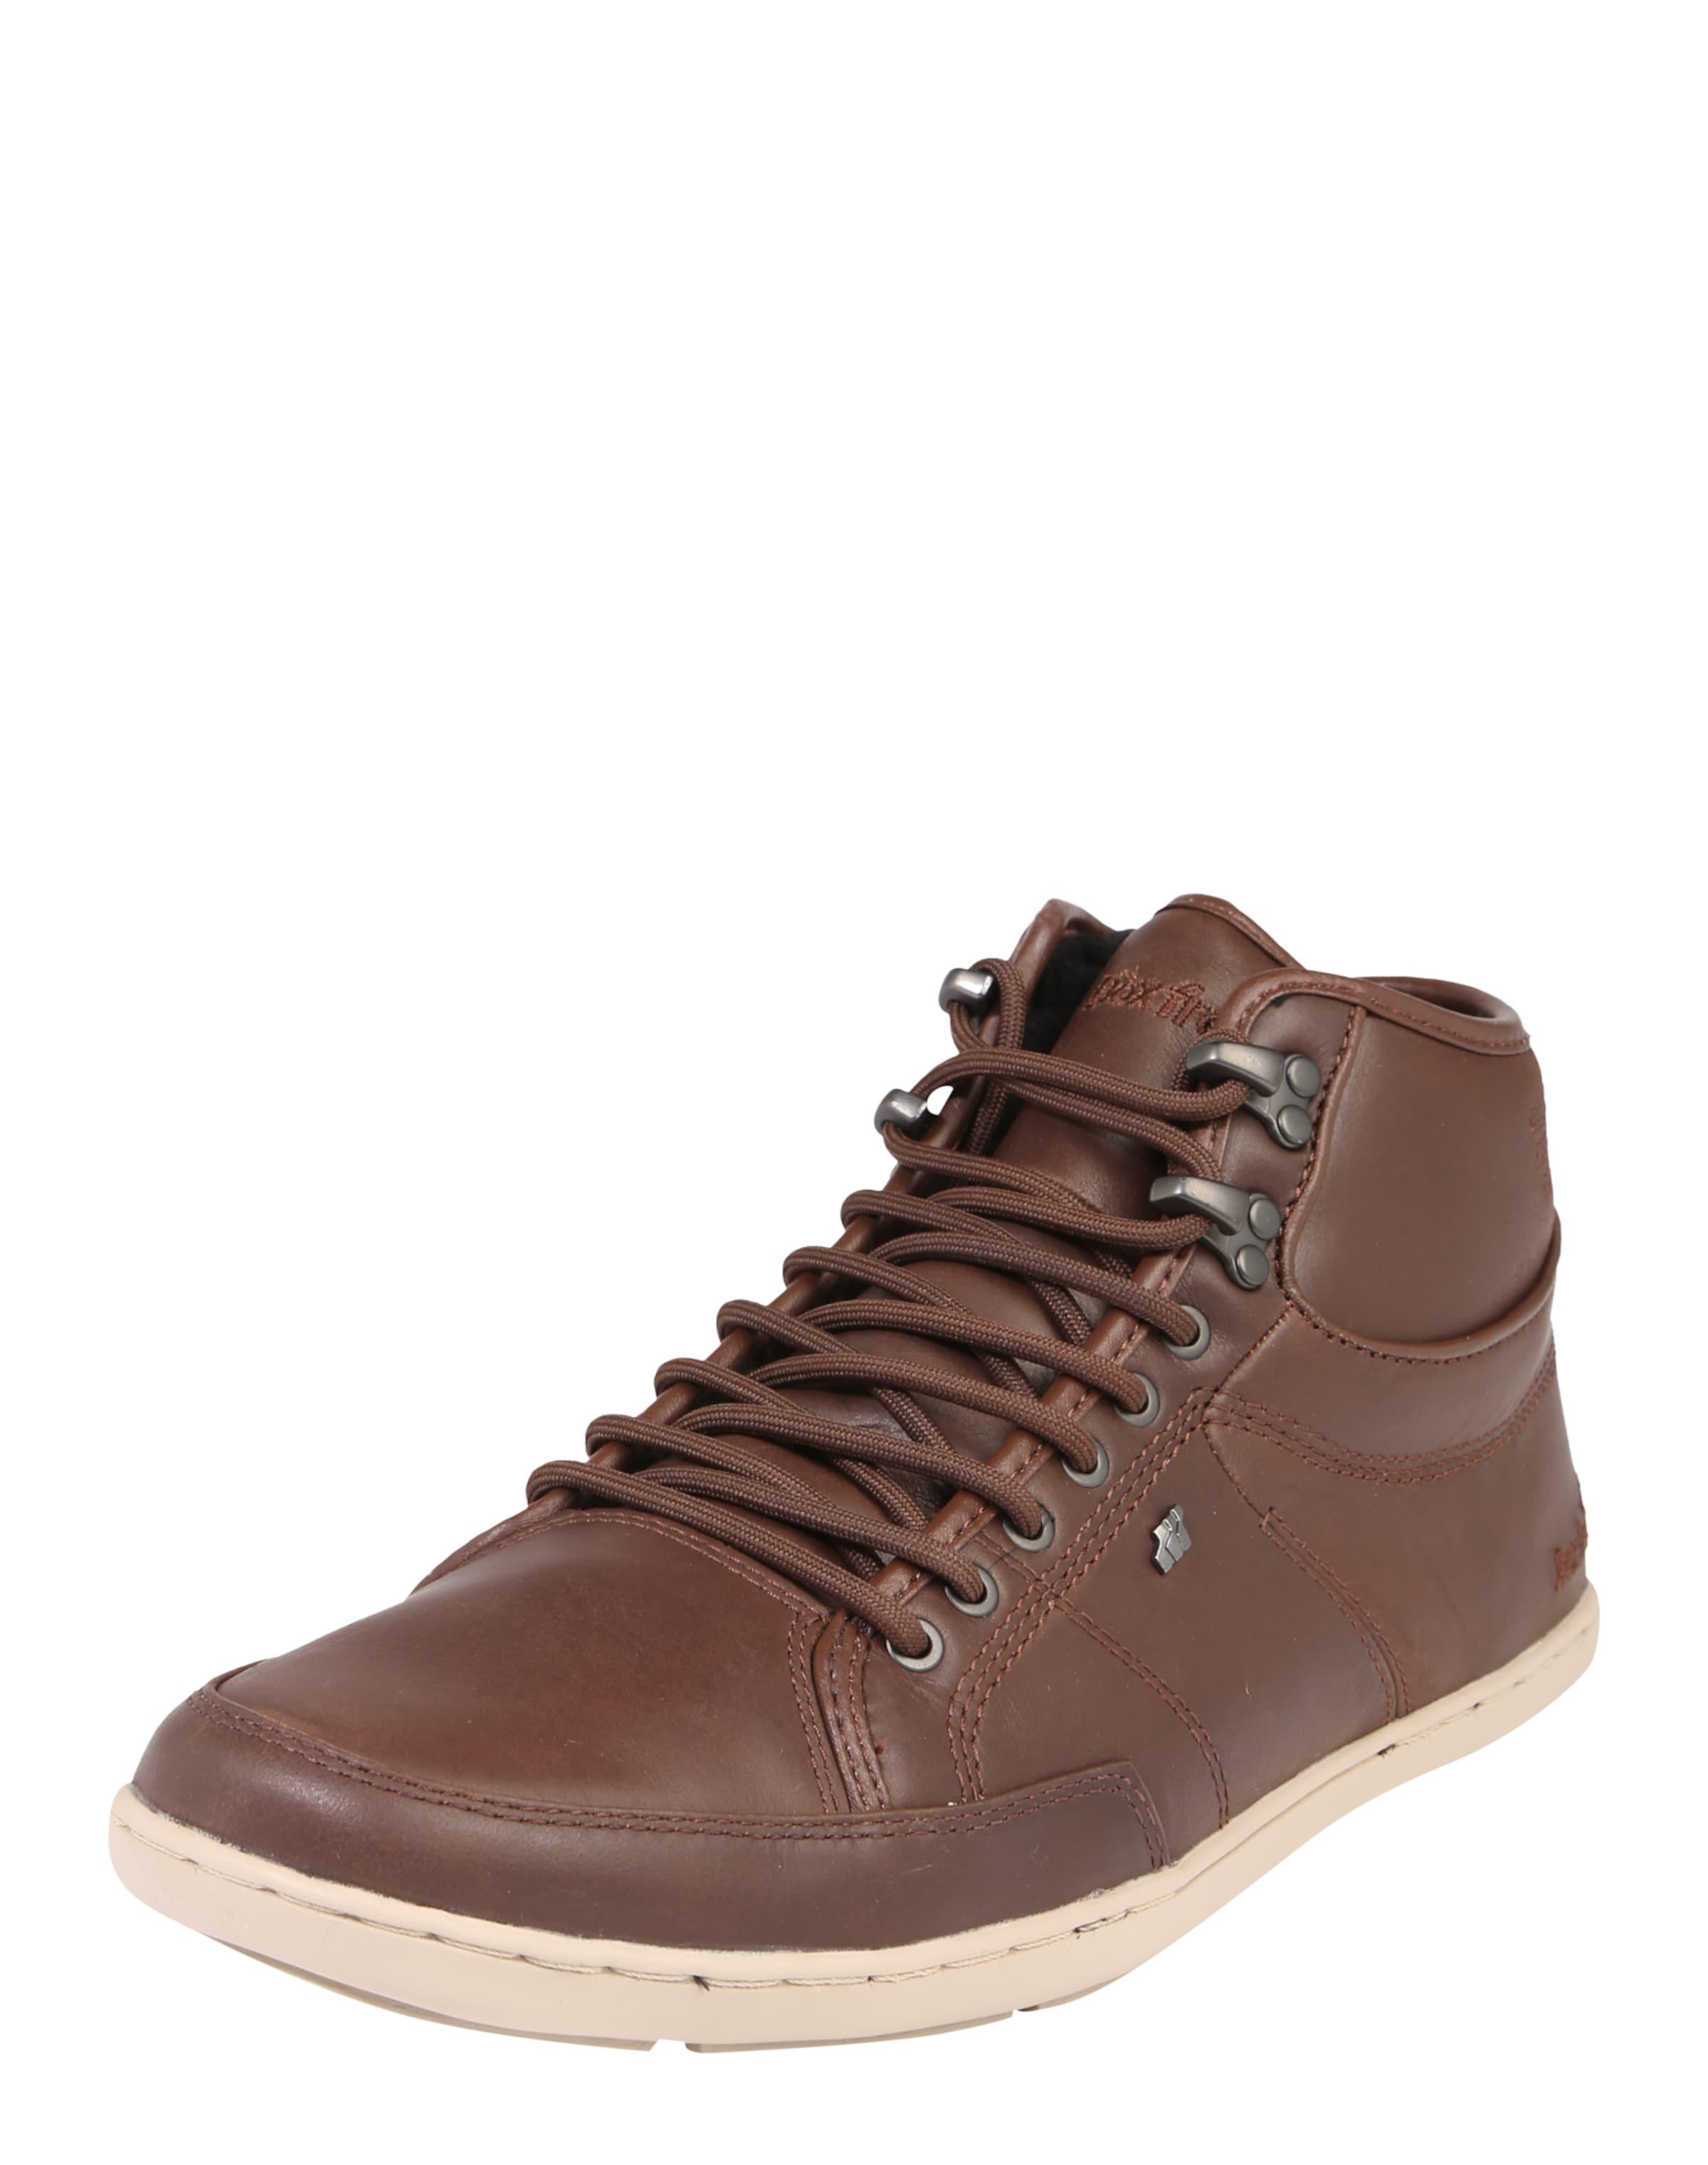 Haltbare Mode billige Schuhe Schuhe BOXFRESH | Sneaker 'Swapp' Schuhe Gut getragene Schuhe billige b4e5c9